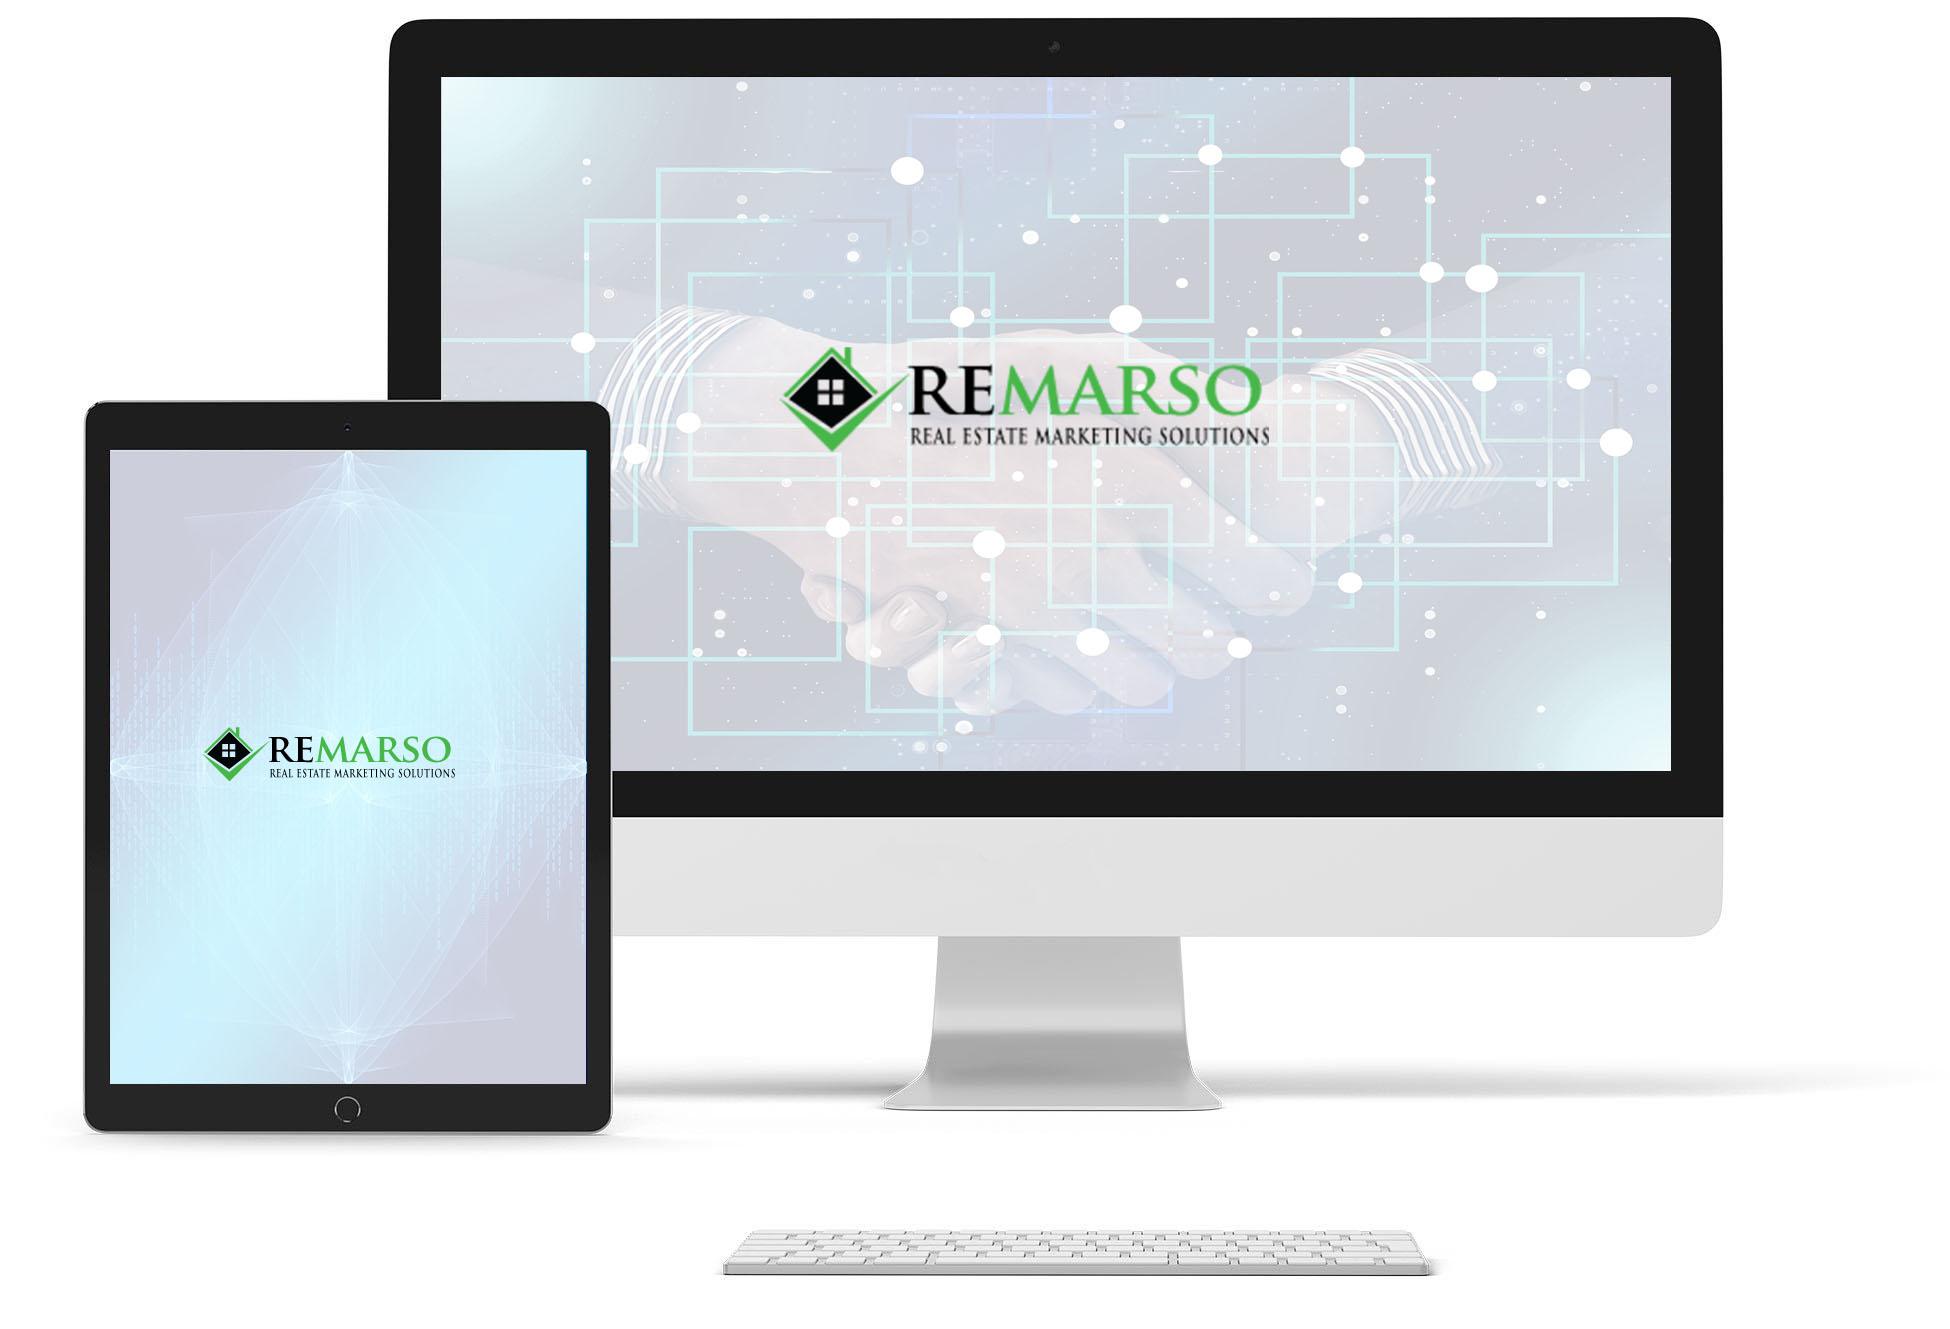 real estate marketing strategies, real estate lead nurturing